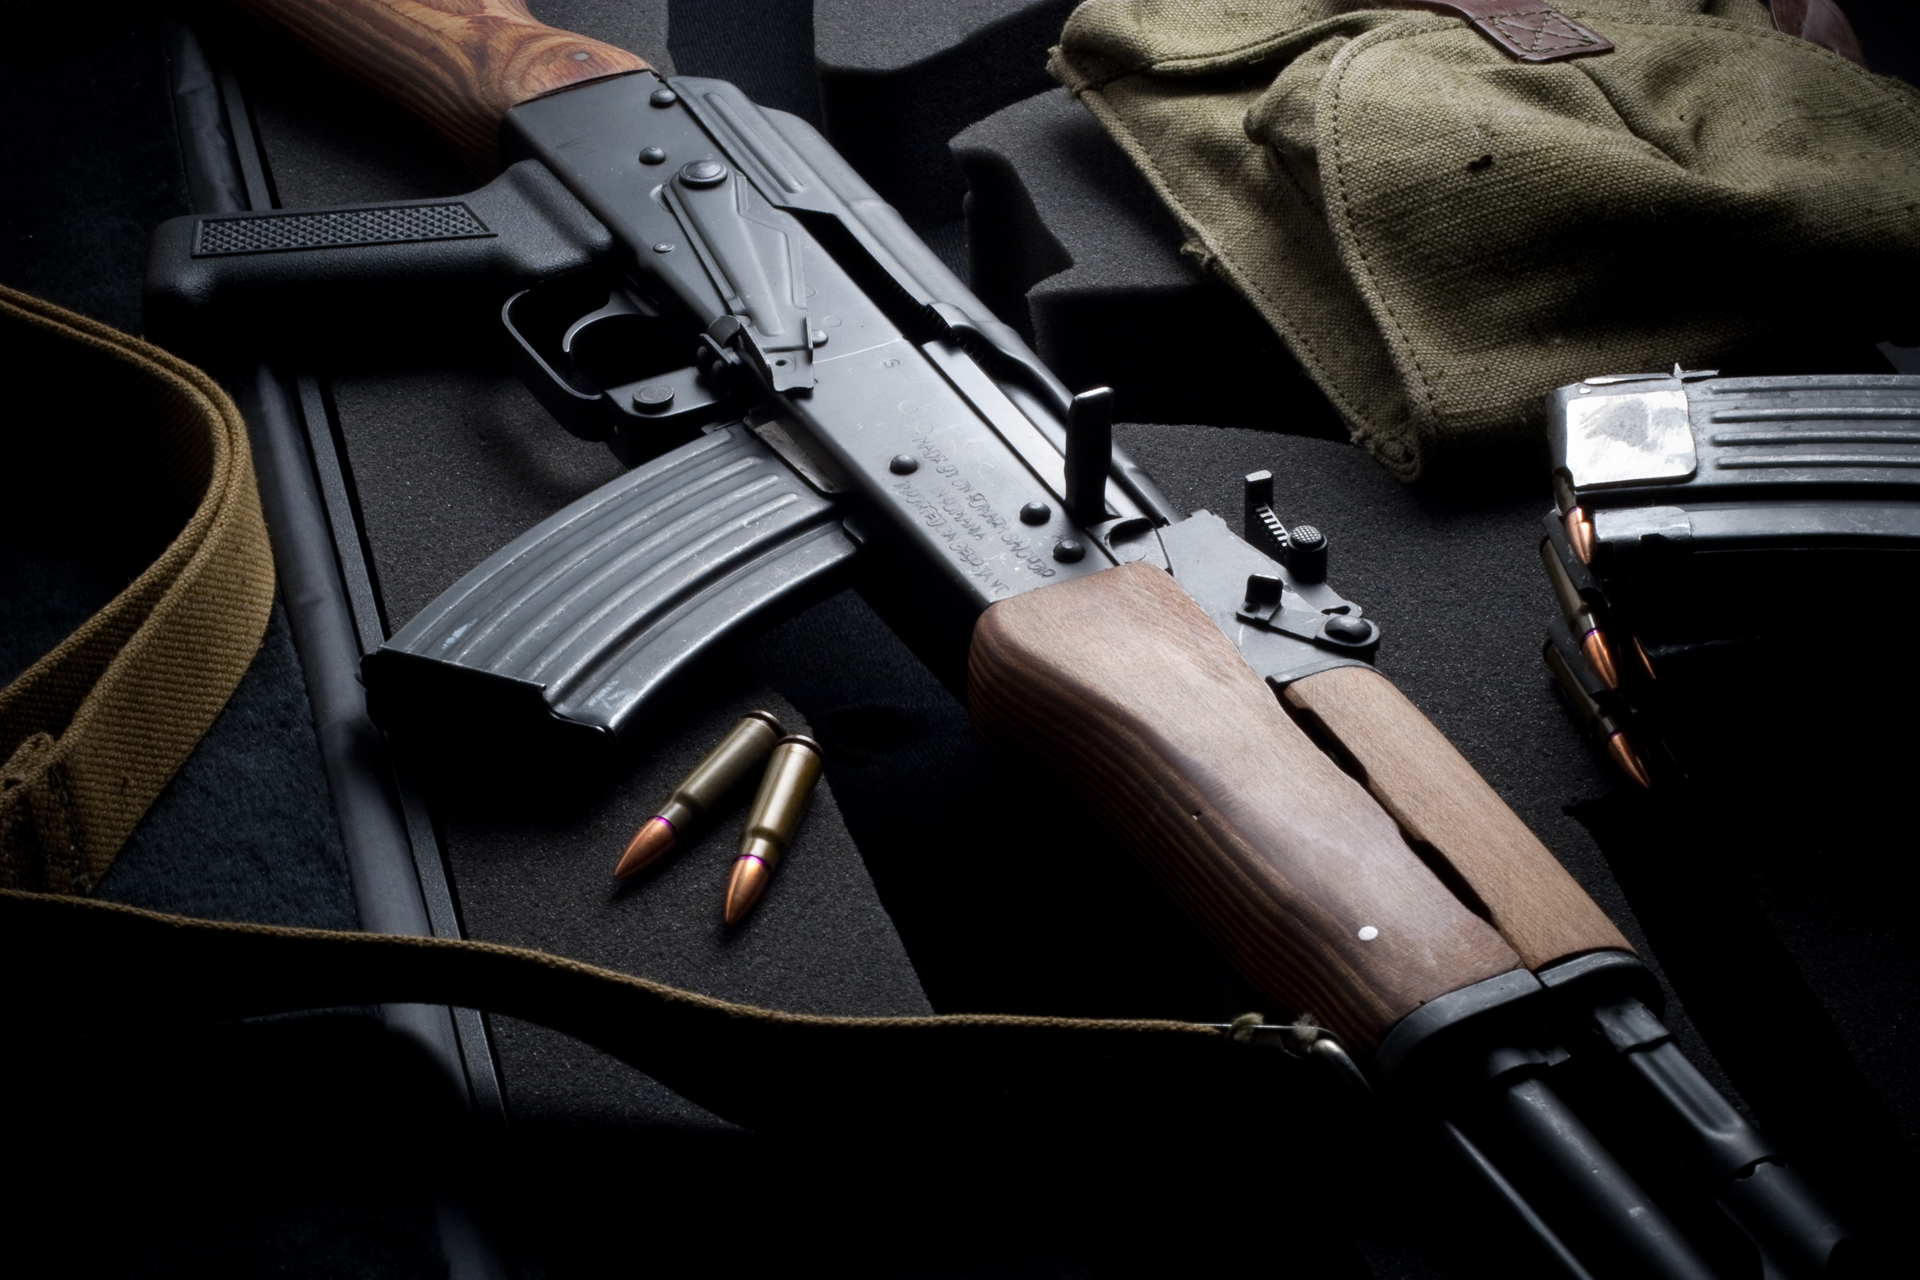 Автомат Калашникова, фото, обои на рабочий стол, Kalashinkov Wallapper, AK-47, АКМ